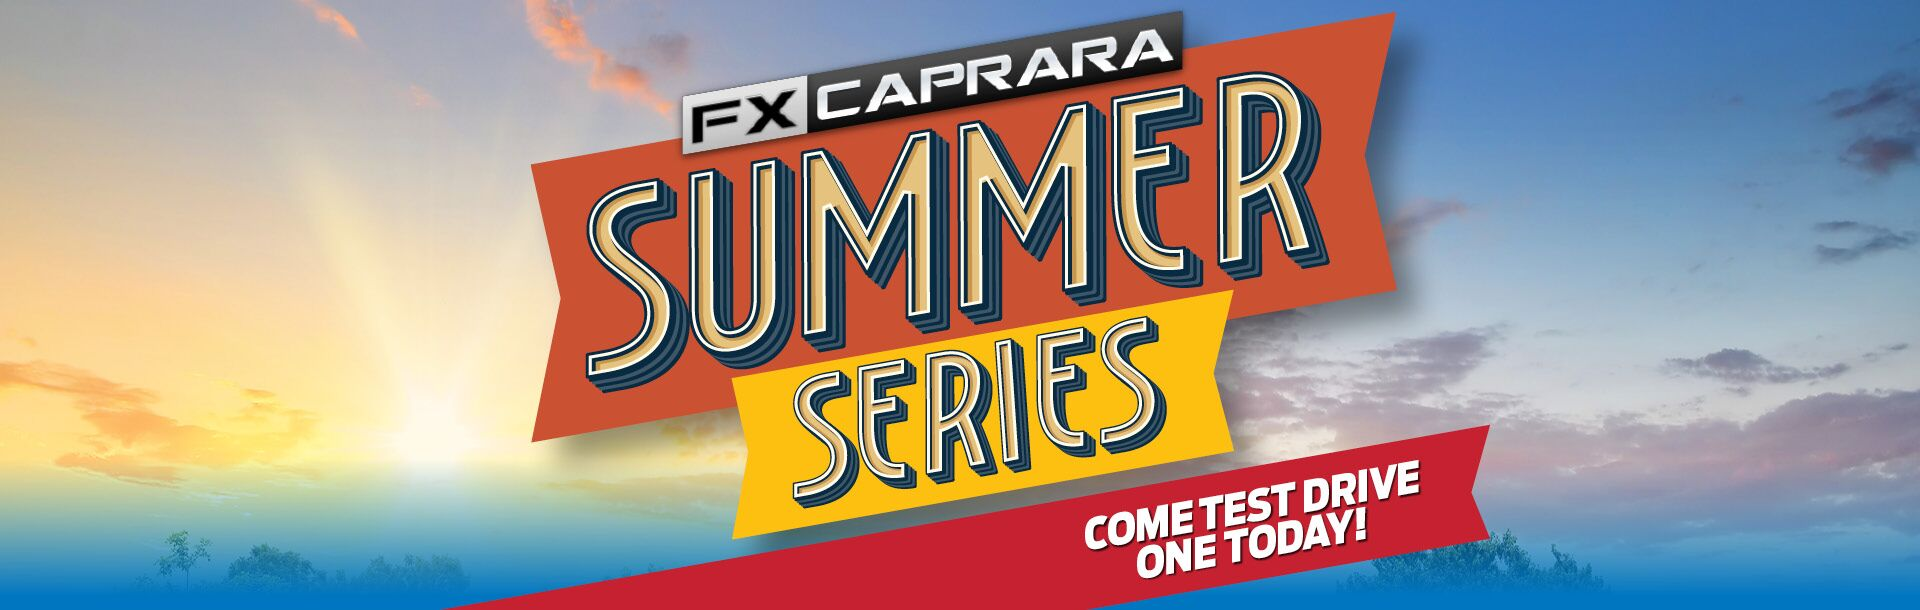 Fx Caprara Ford >> FX Caprara Car Companies Super Stores Watertown NY